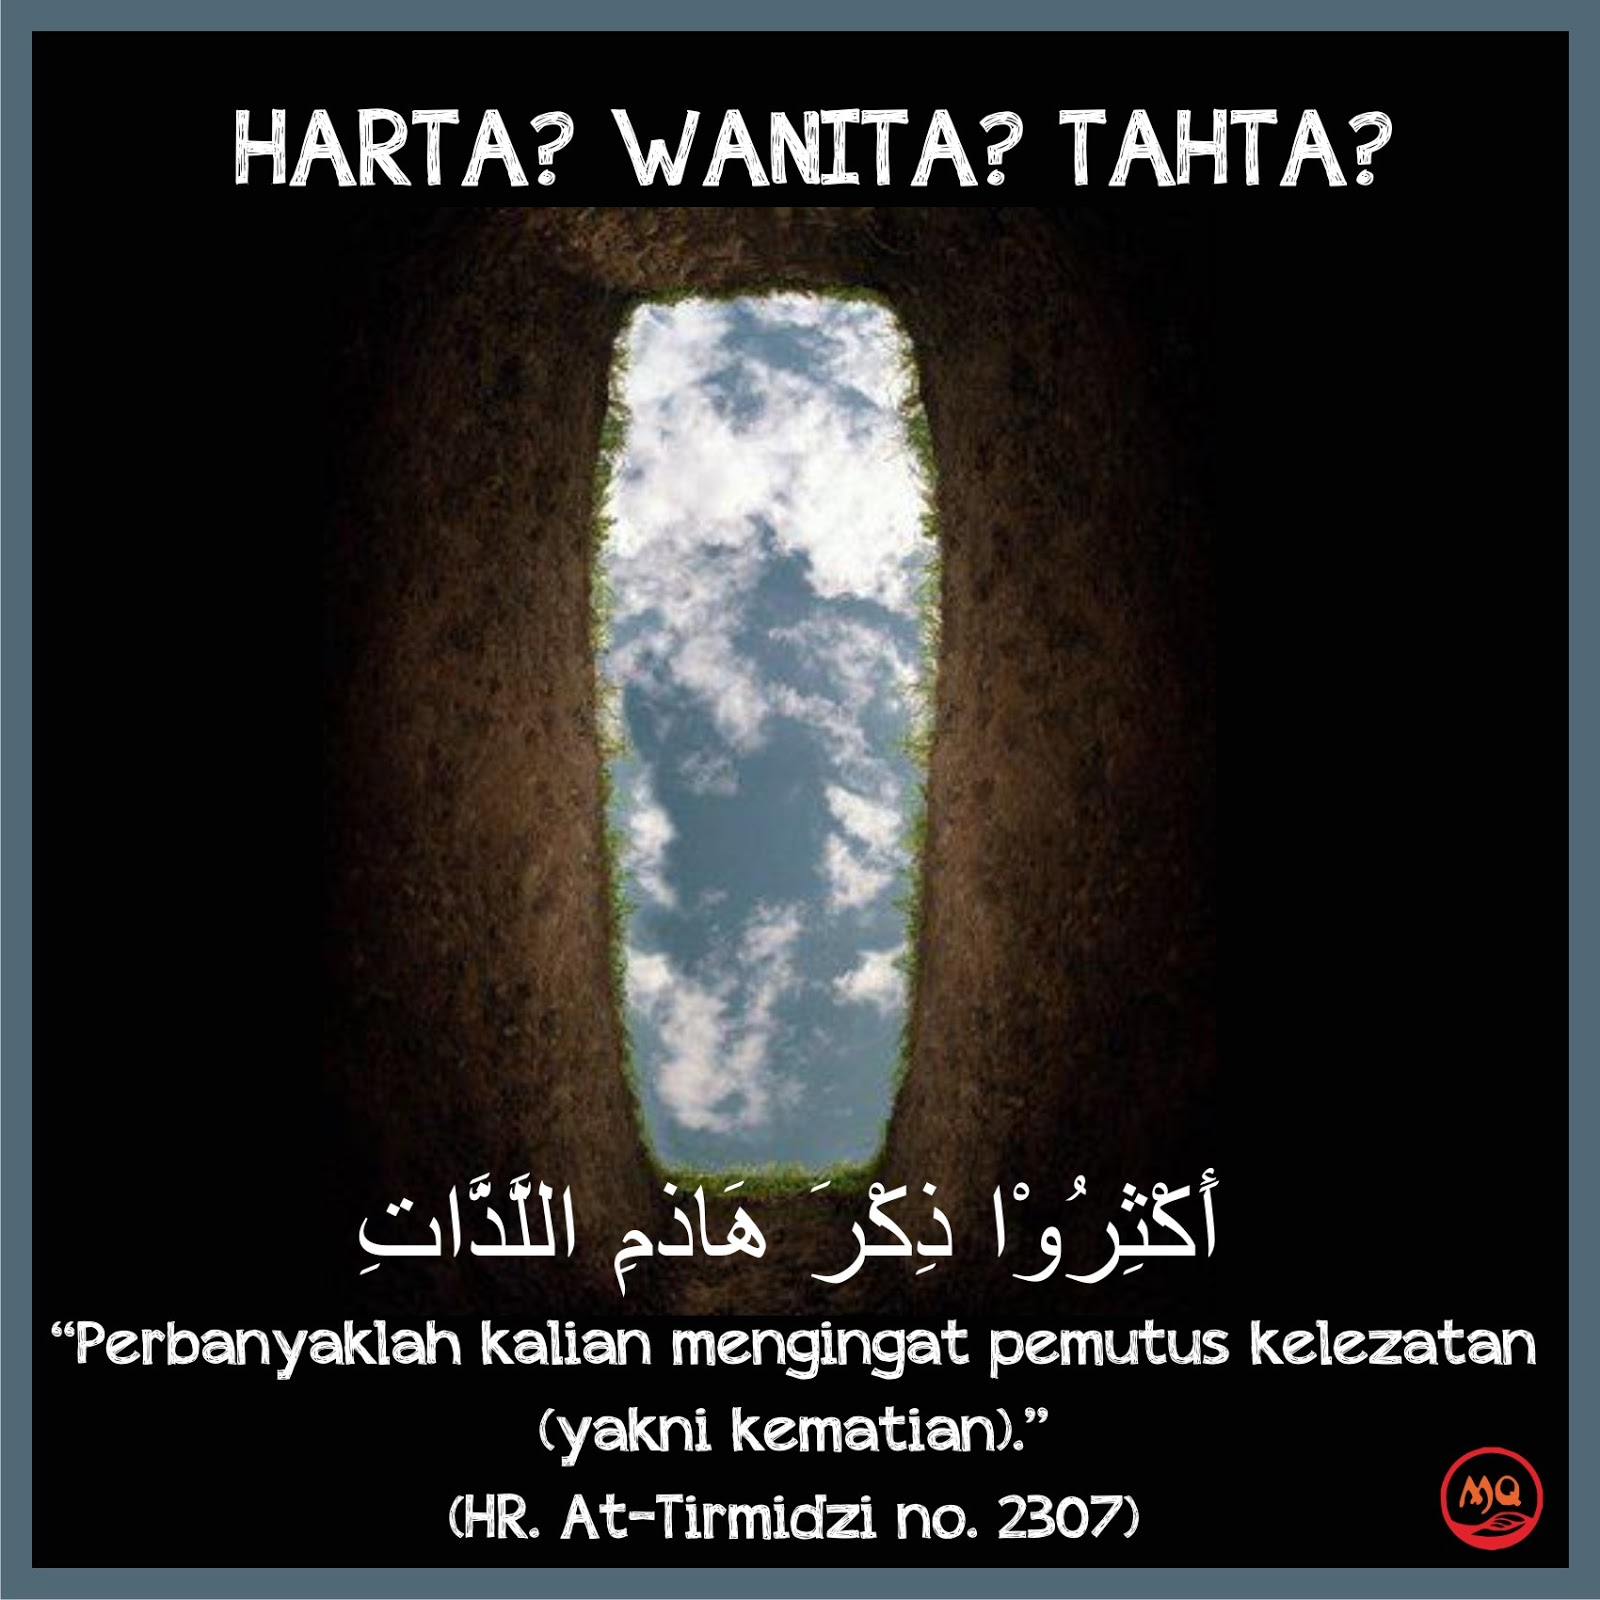 Smp Muhammadiyah 29 Sawangan Depok Pidato Tentang Mengingat Kematian